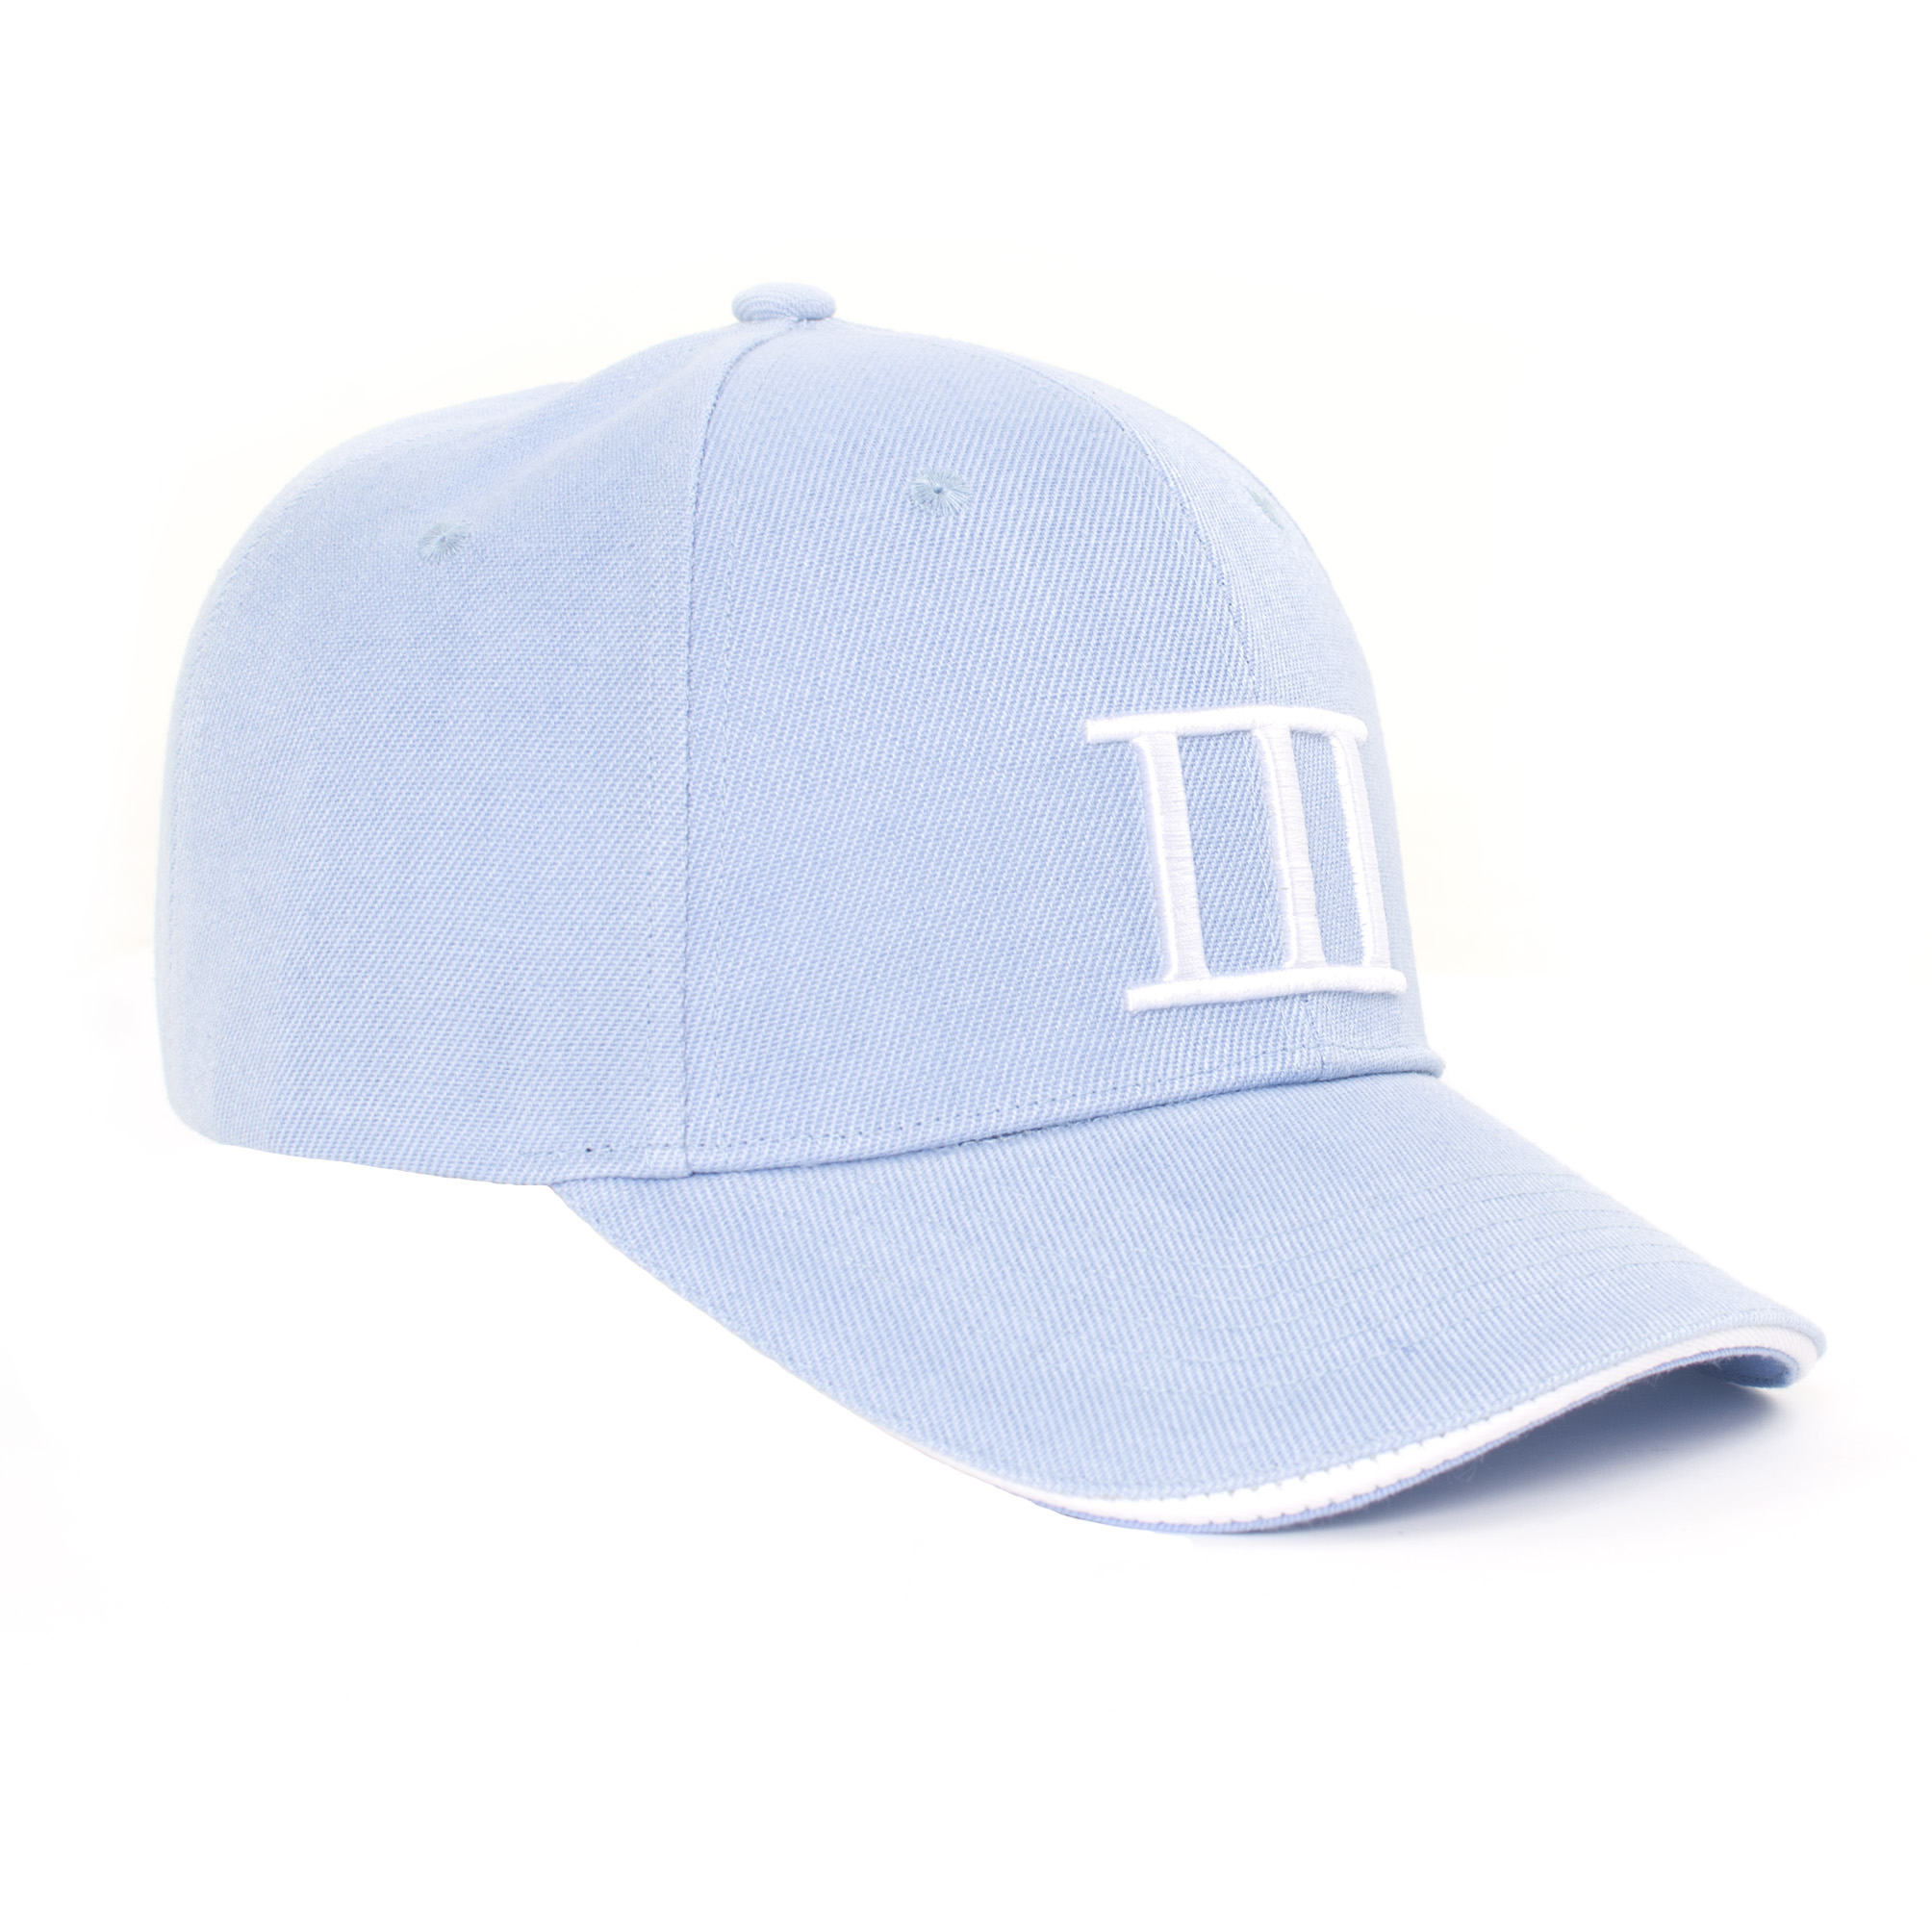 Tommy | Baseball cap light blue